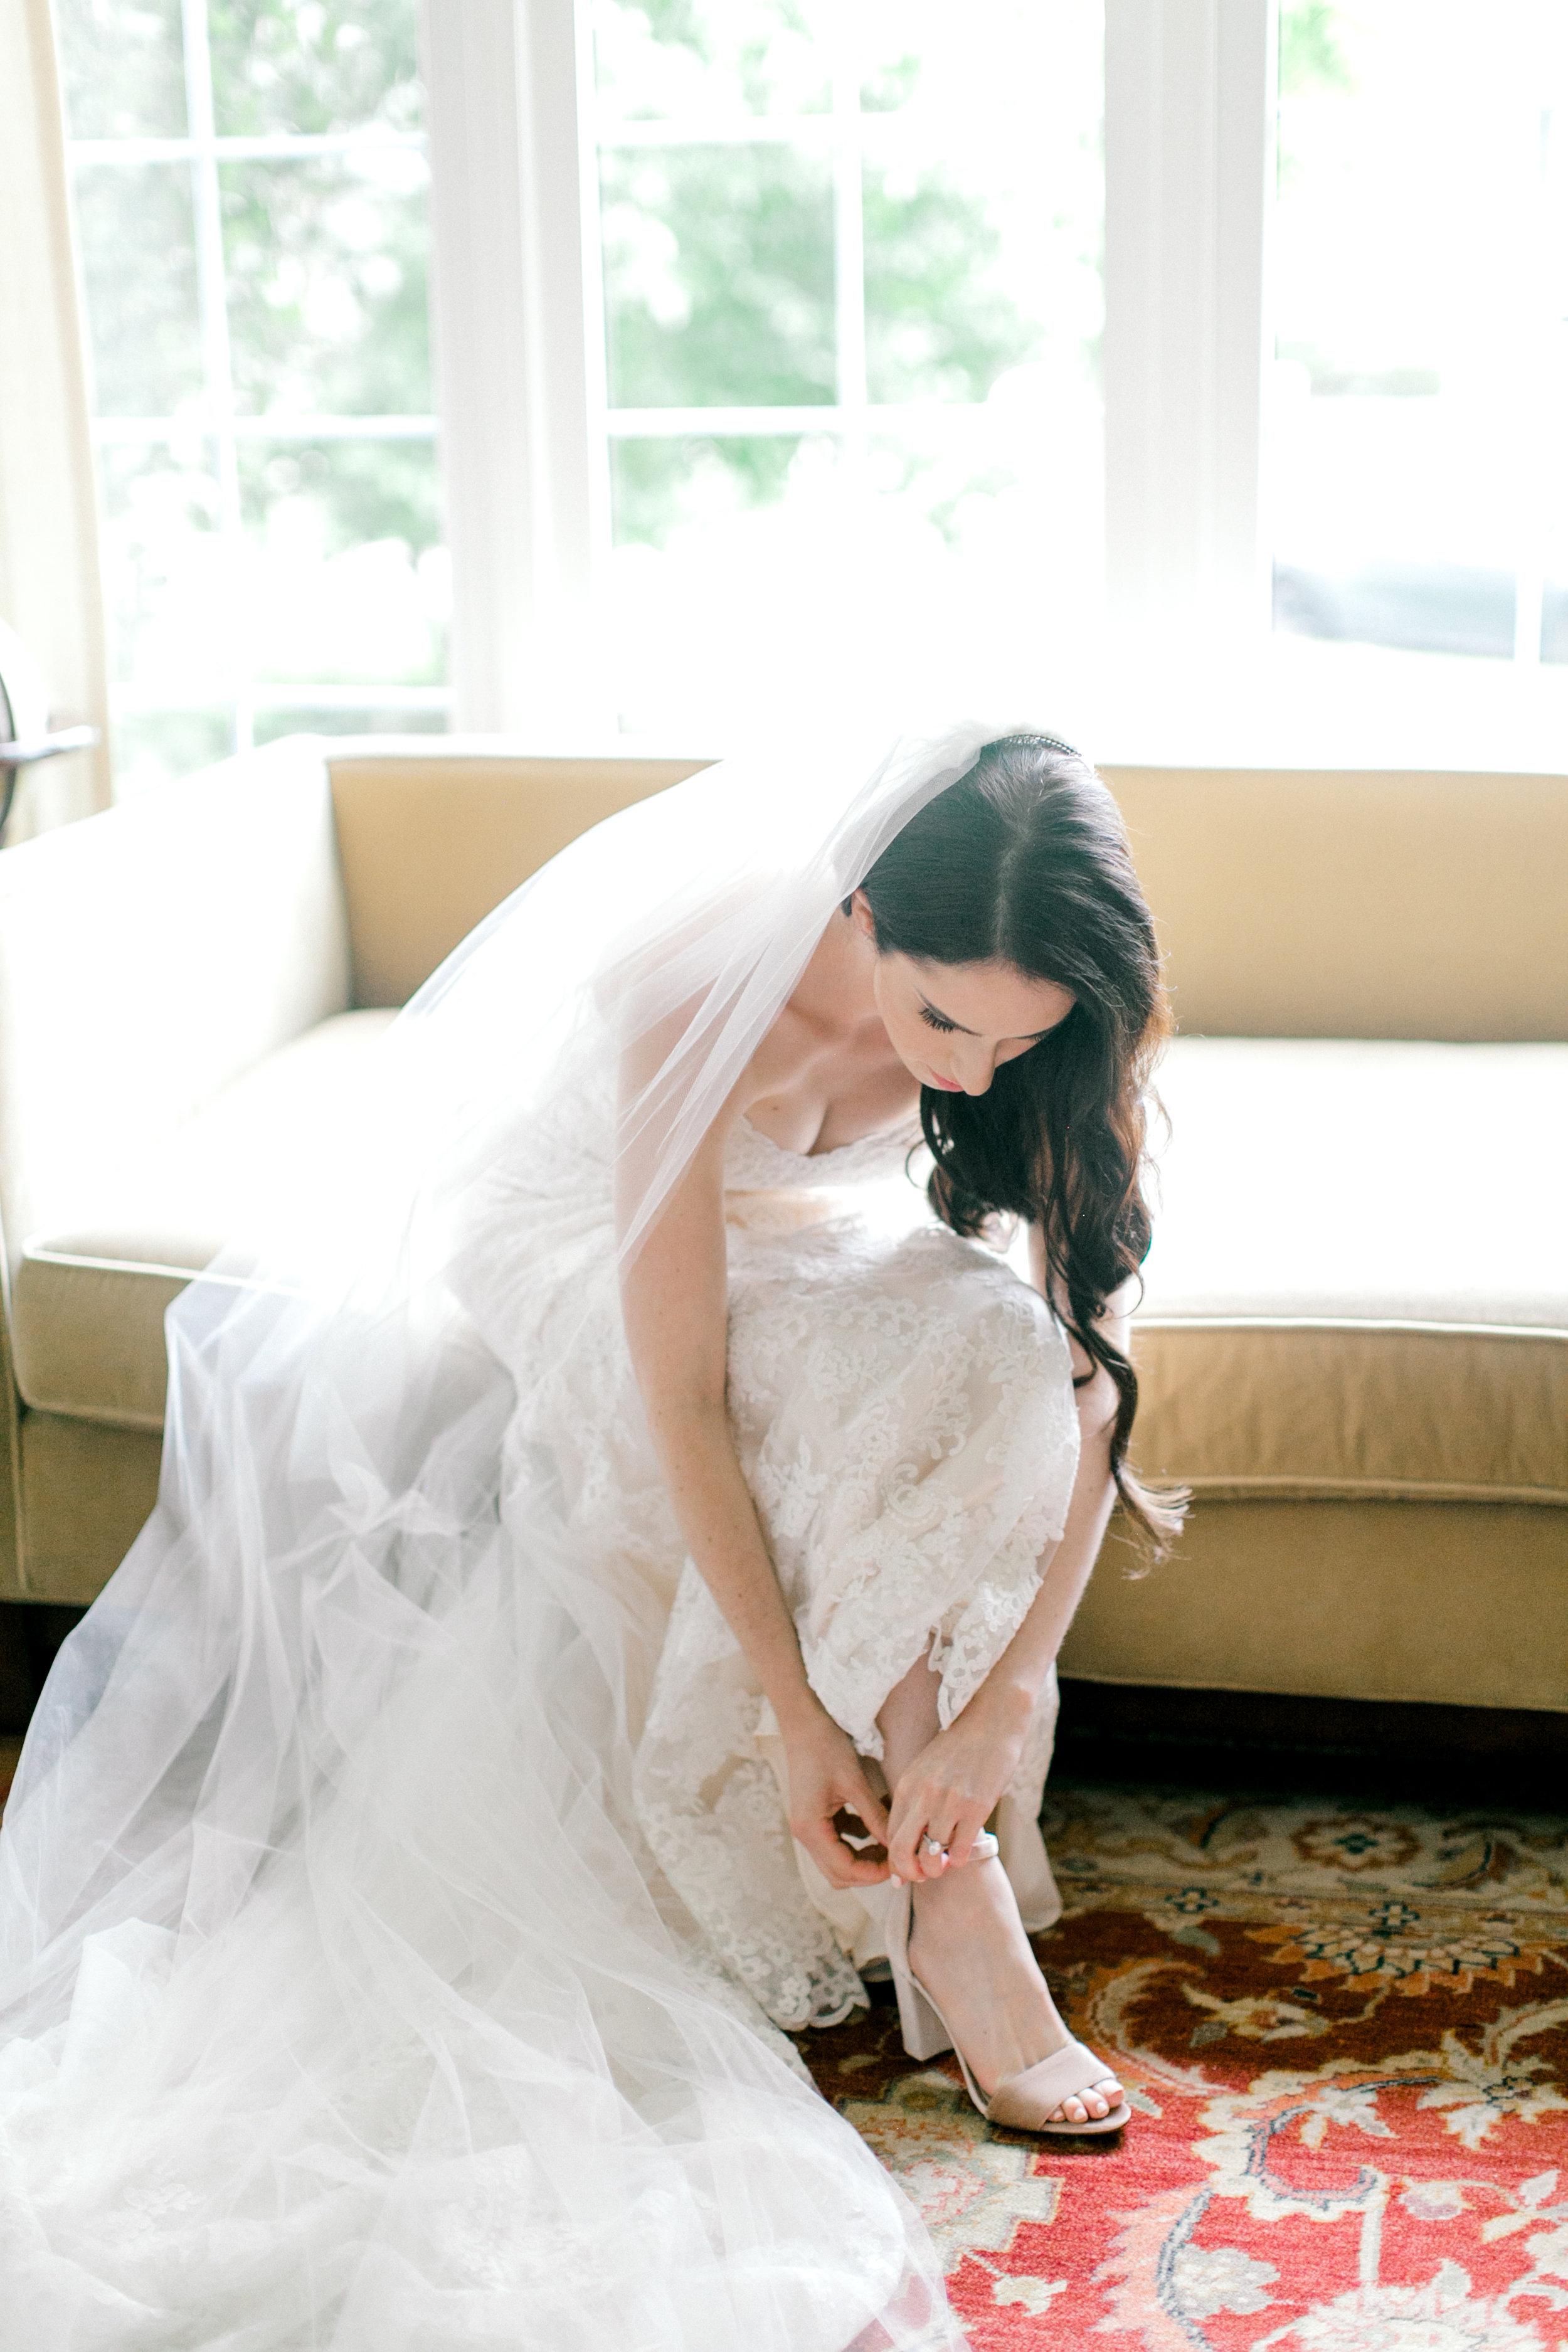 kurtz-wedding-toronto-photographer-langdon-film-richelle-hunter-anna-rob-previews-6.jpg